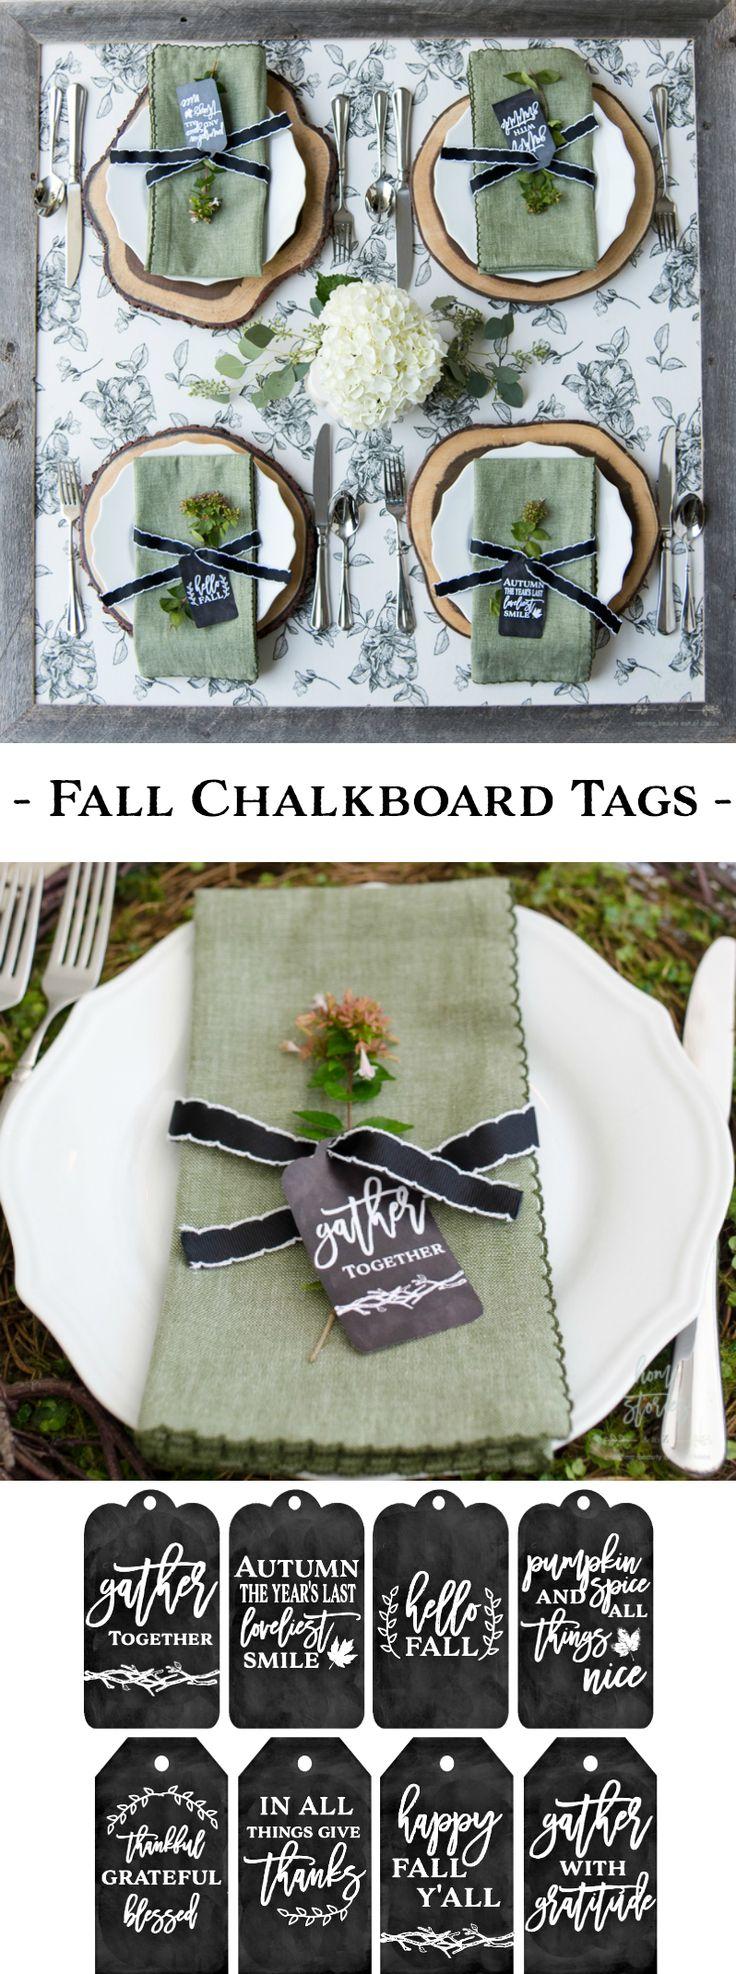 fall chalkboard tags free printable